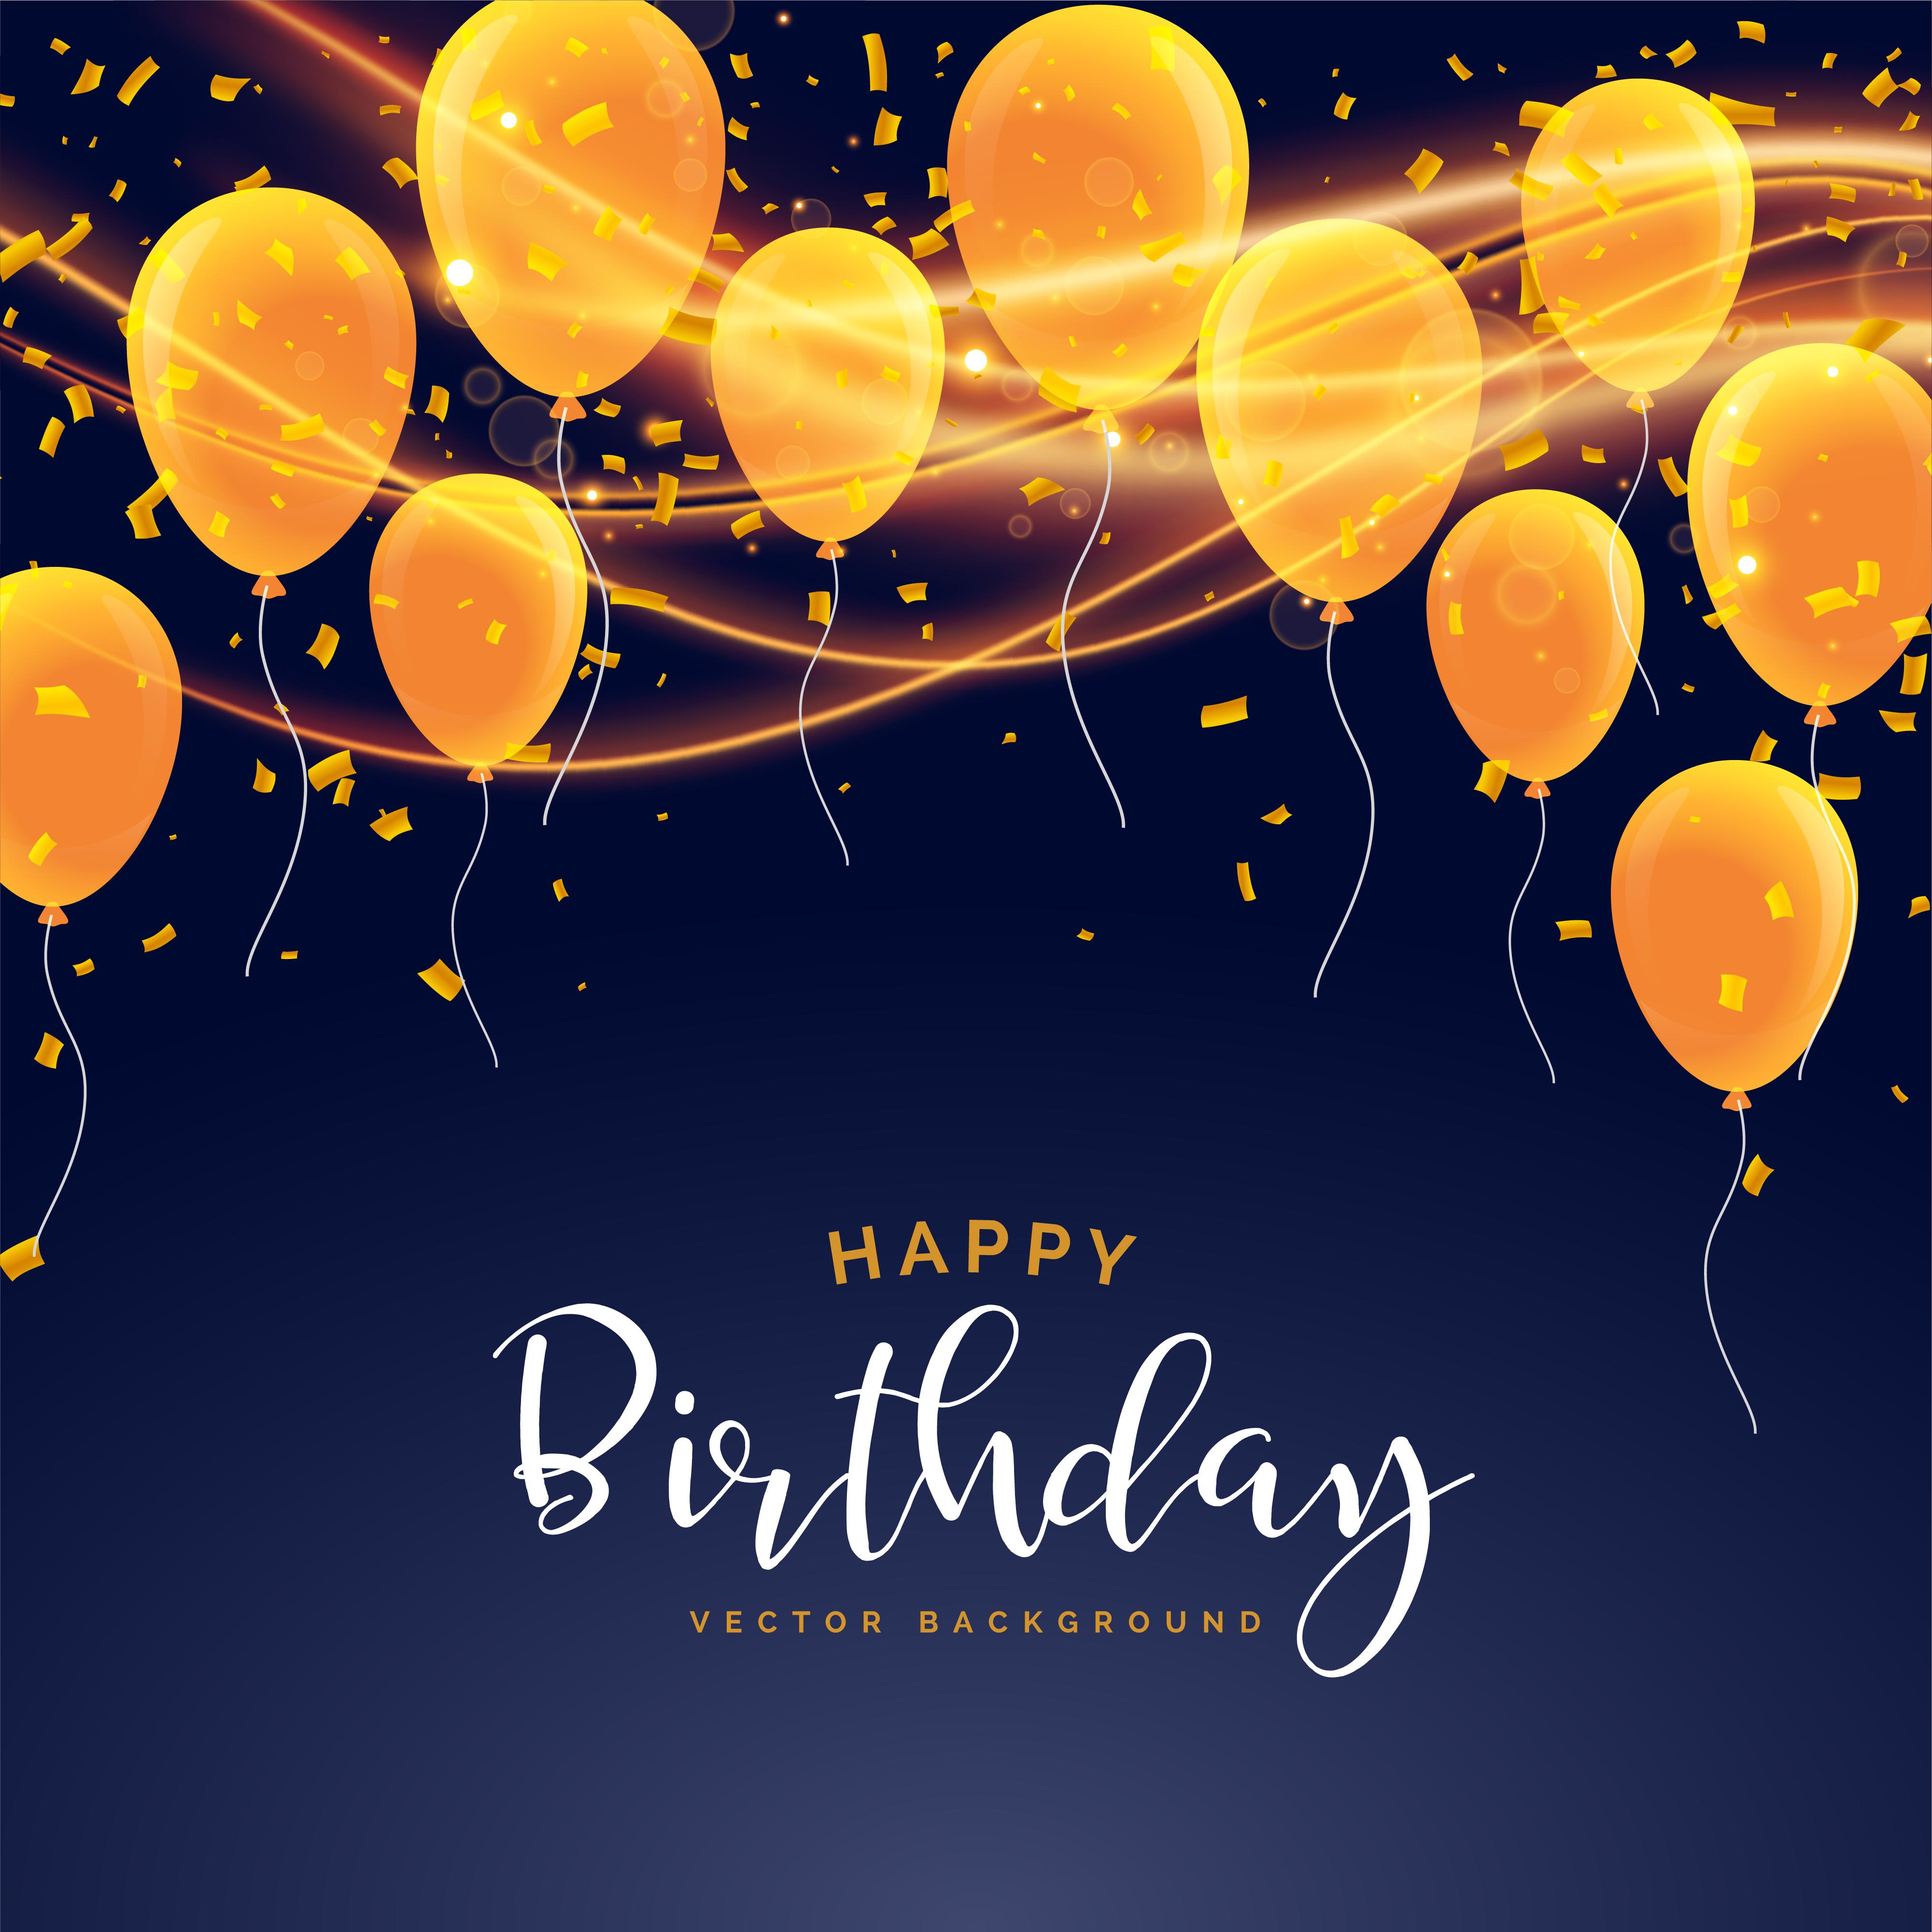 birthday card free vector art  50012 free downloads